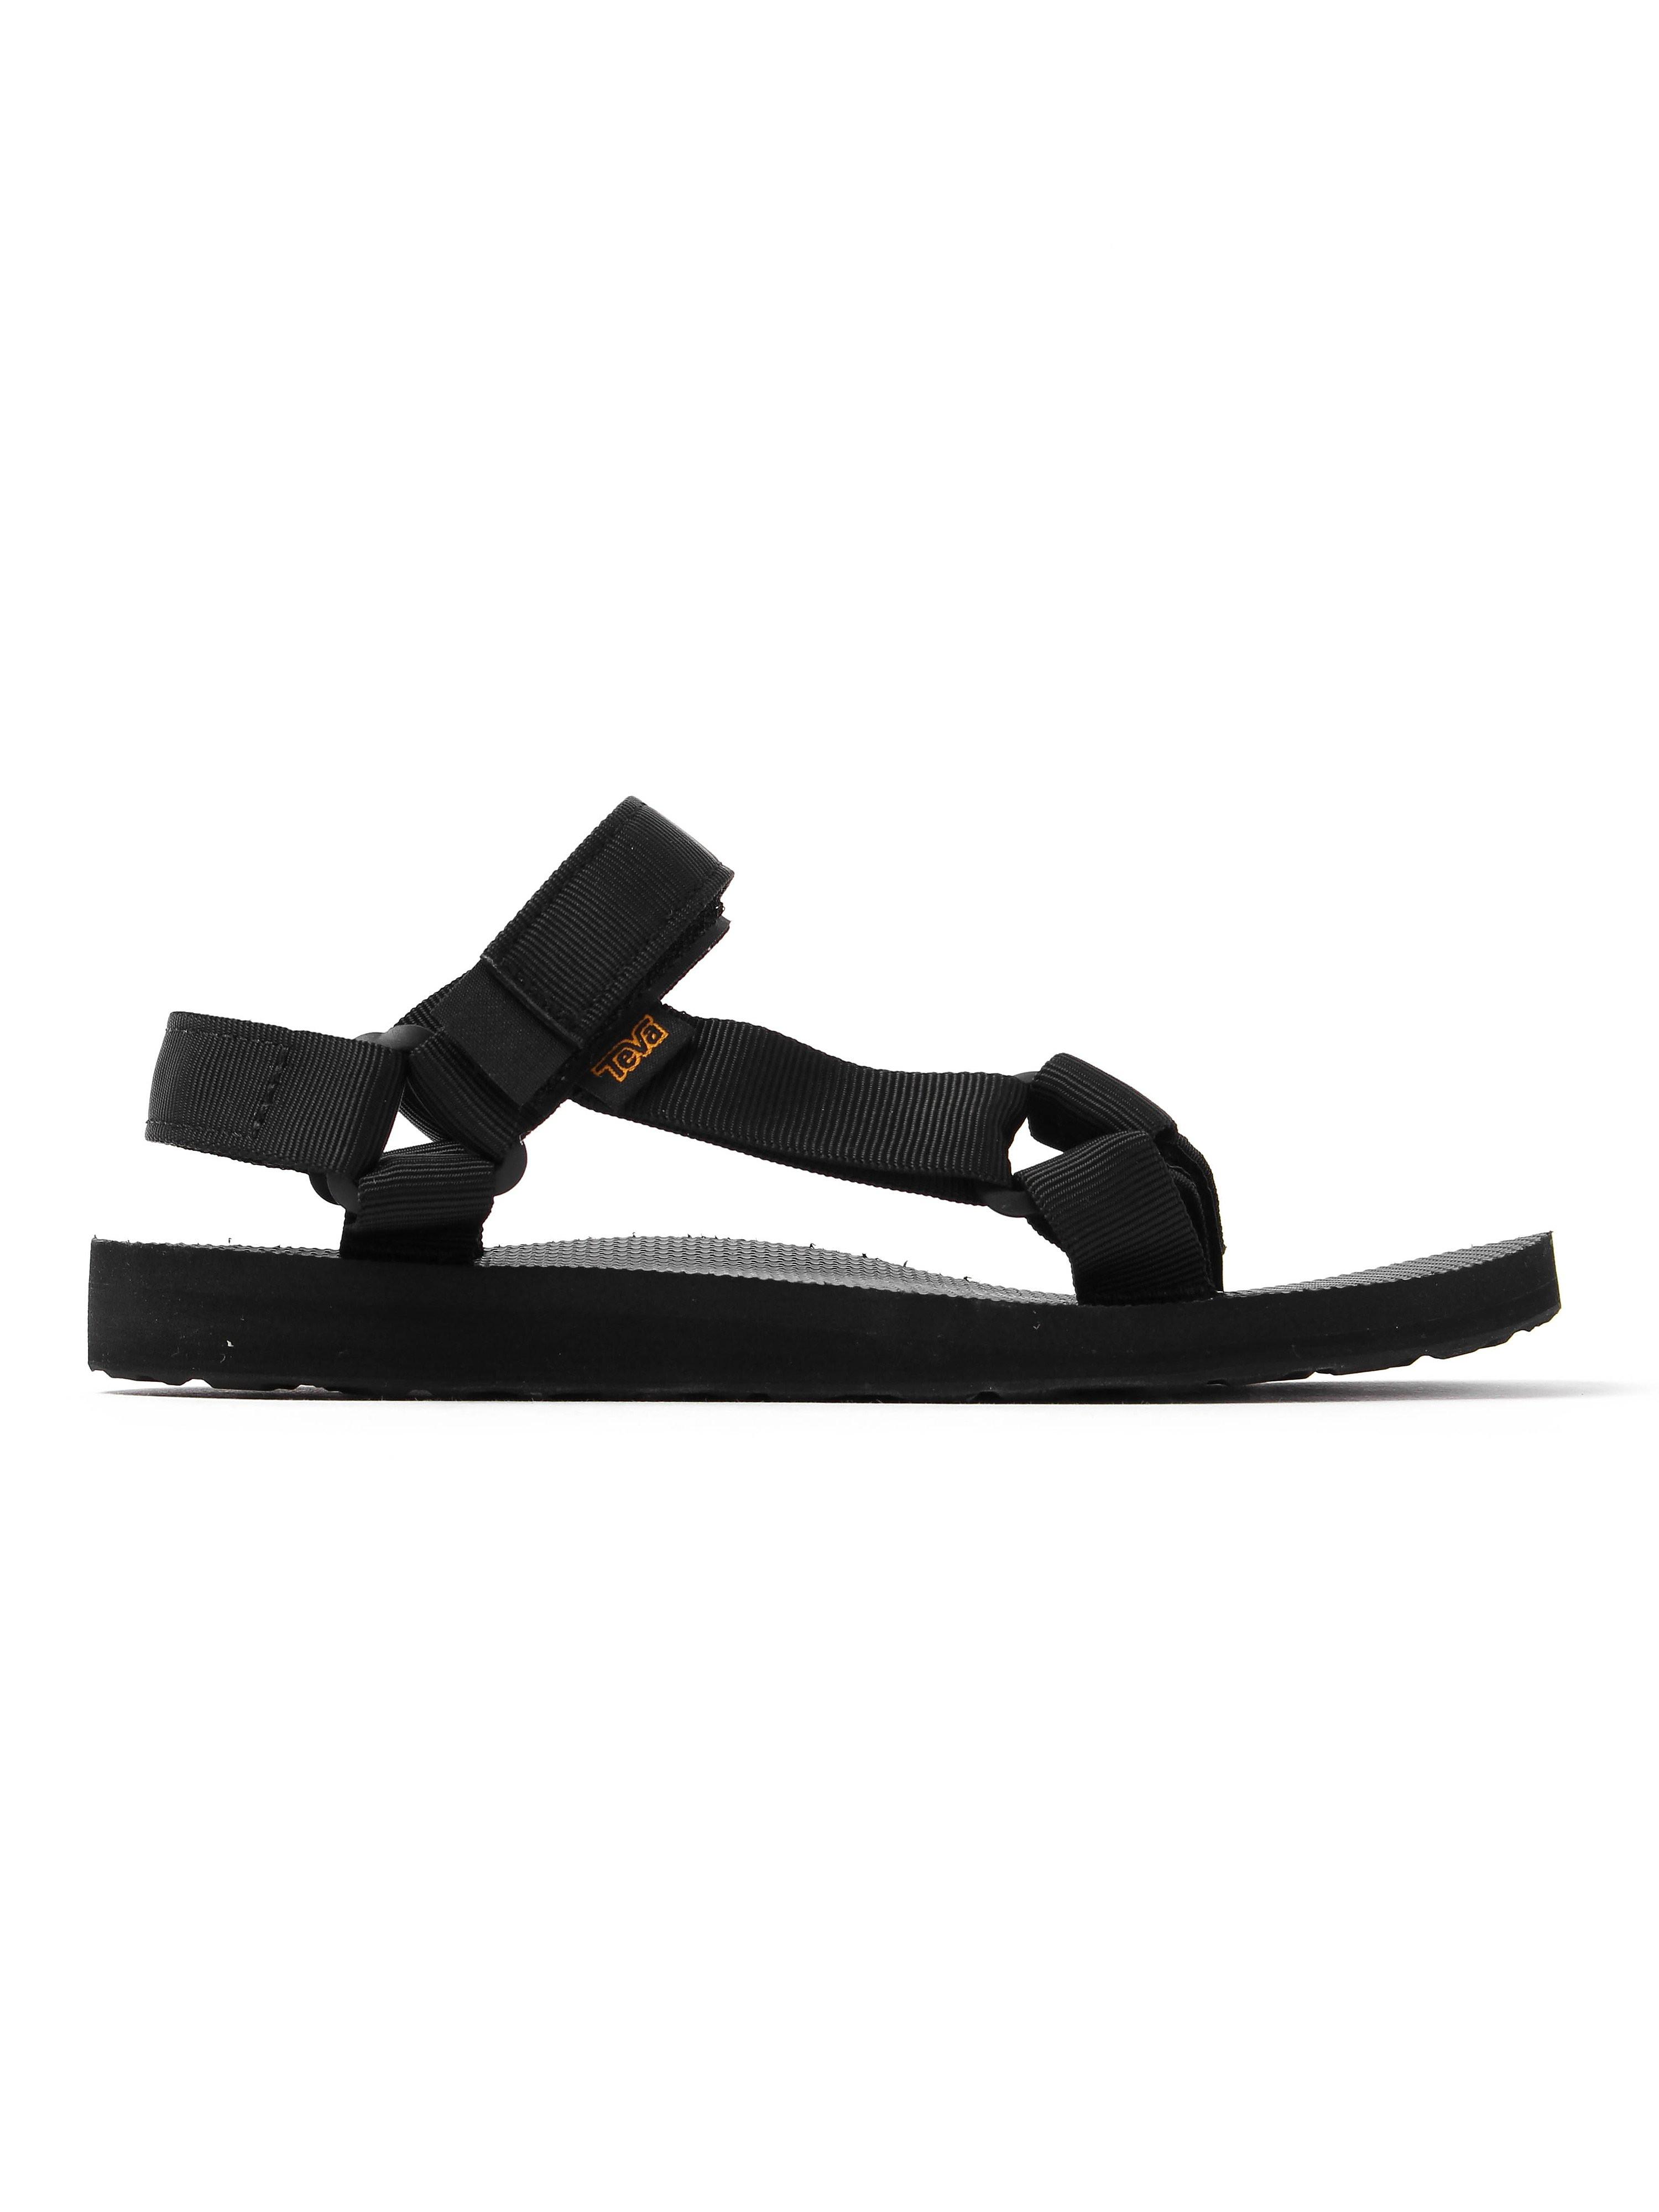 Teva Women's Original Universal Sandals - Black